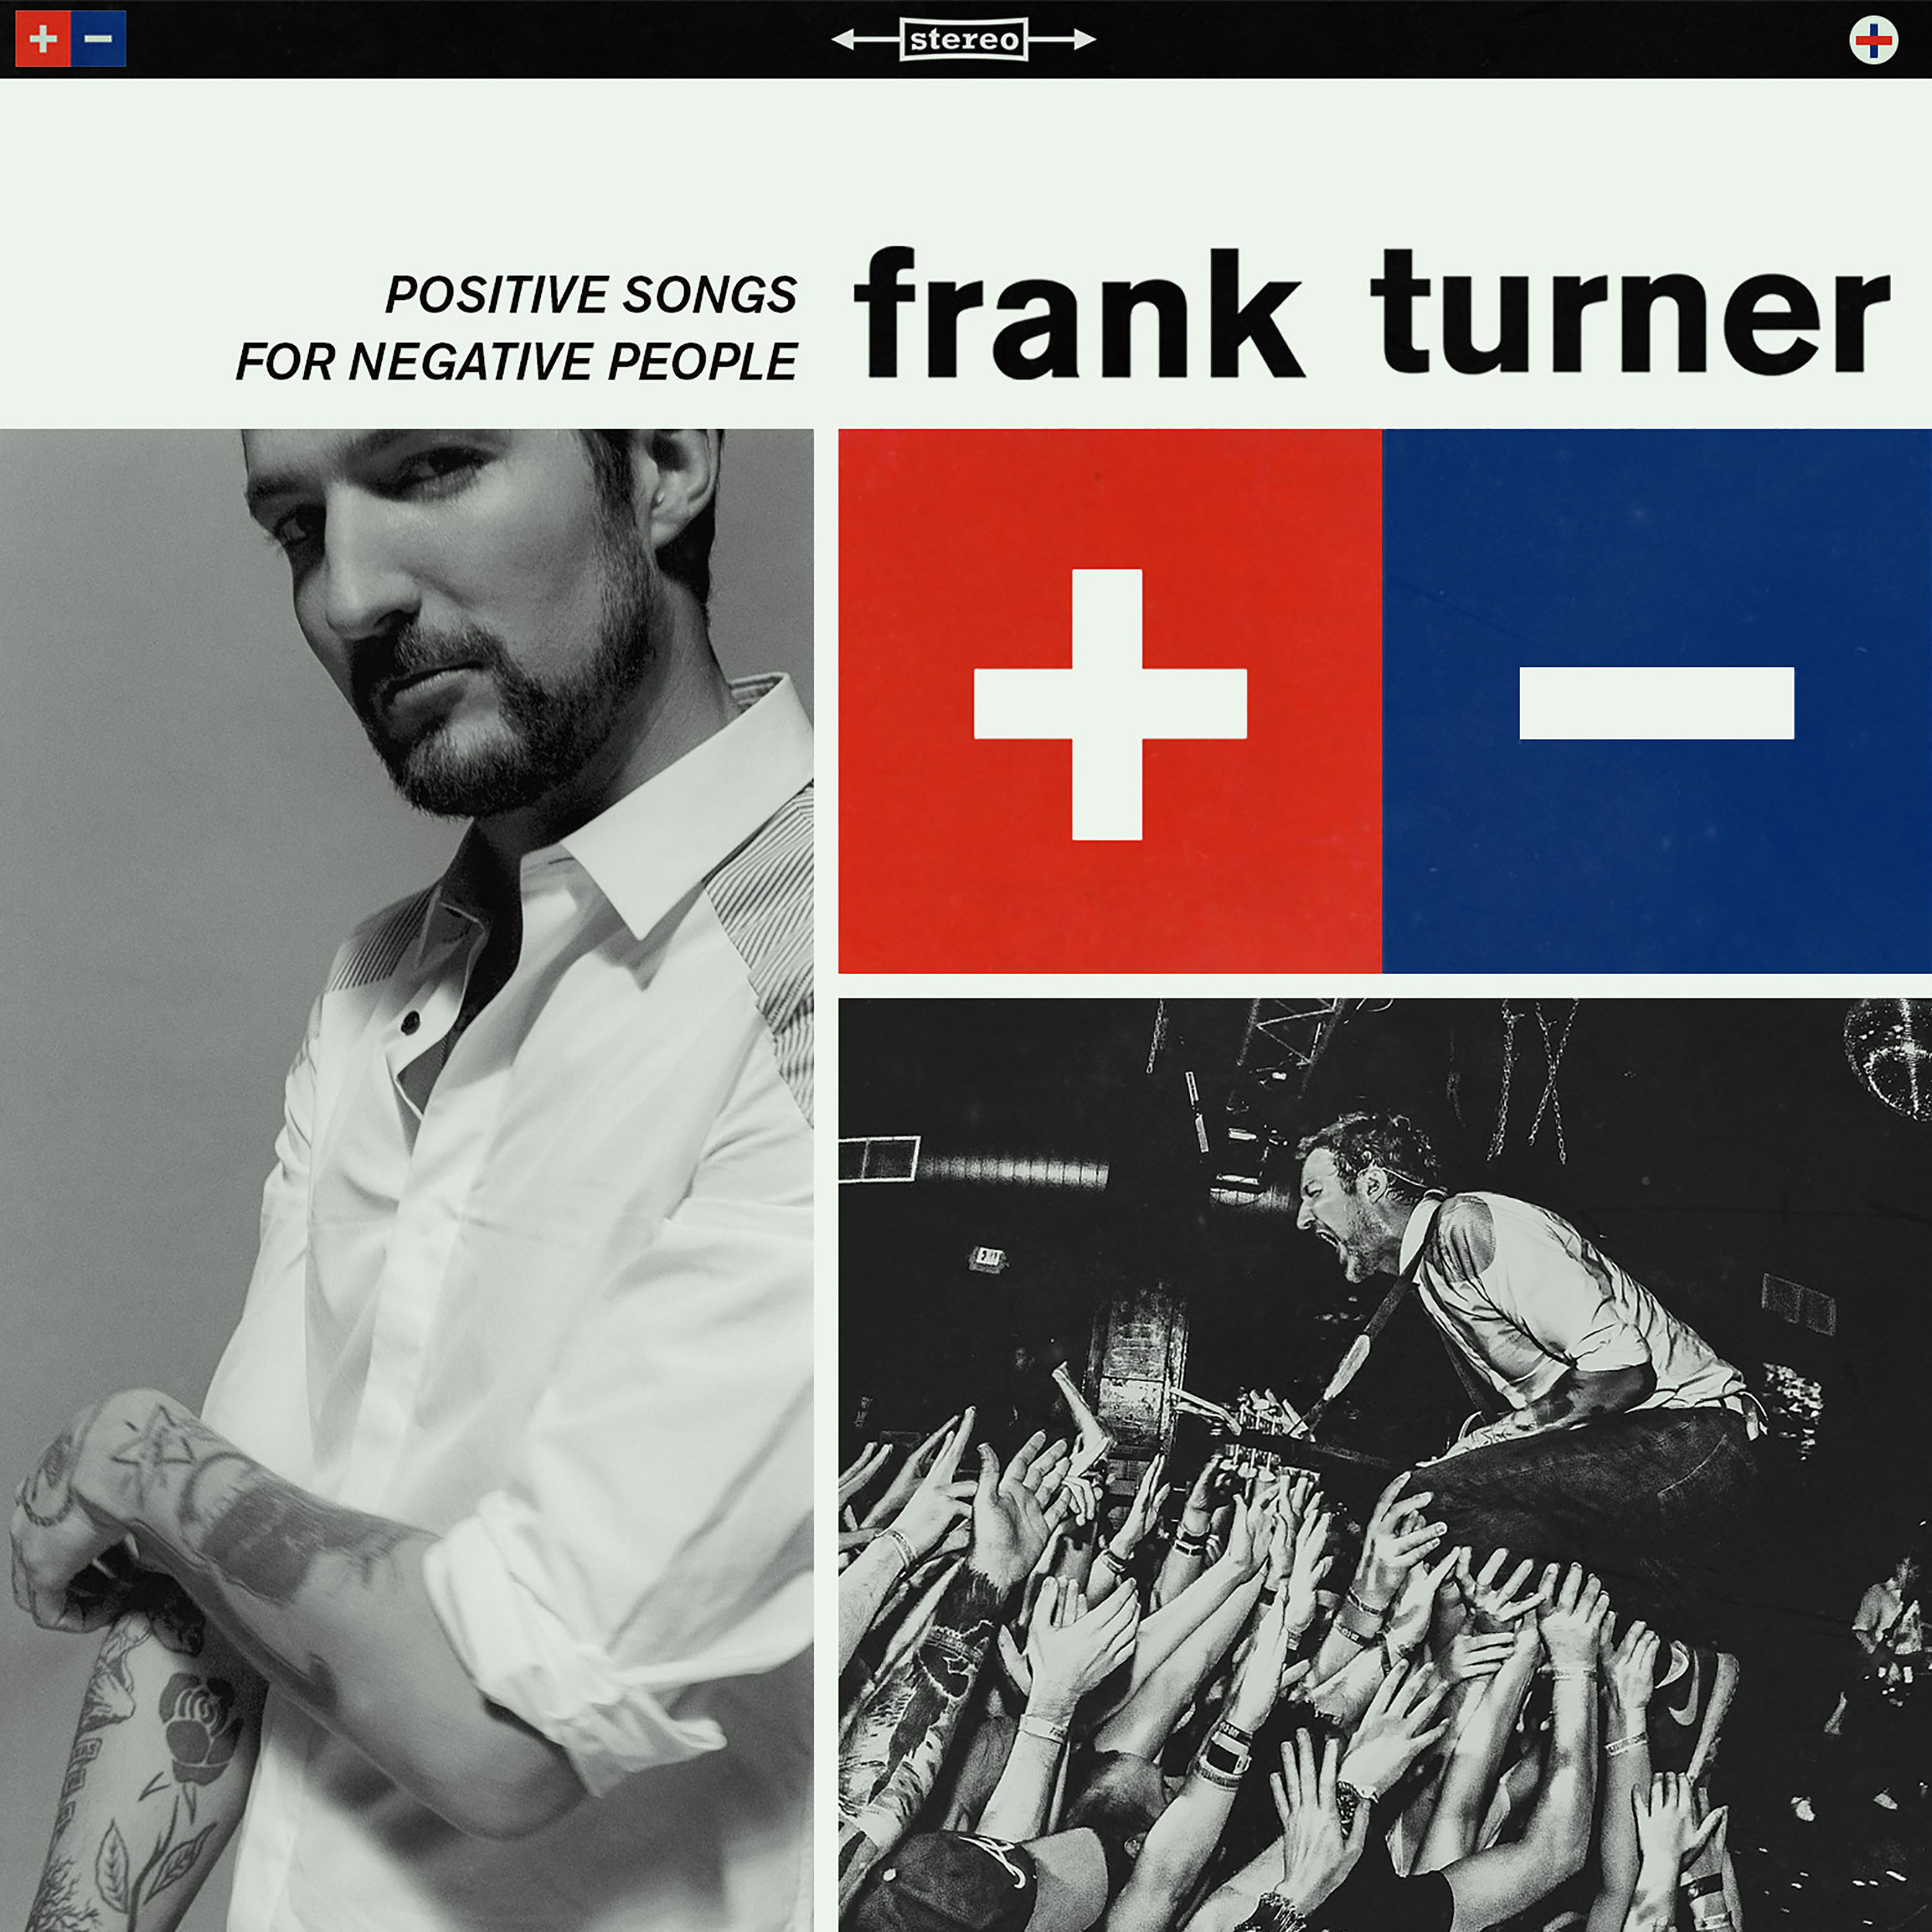 Get Better (original album version) – Click to listen on Spotify